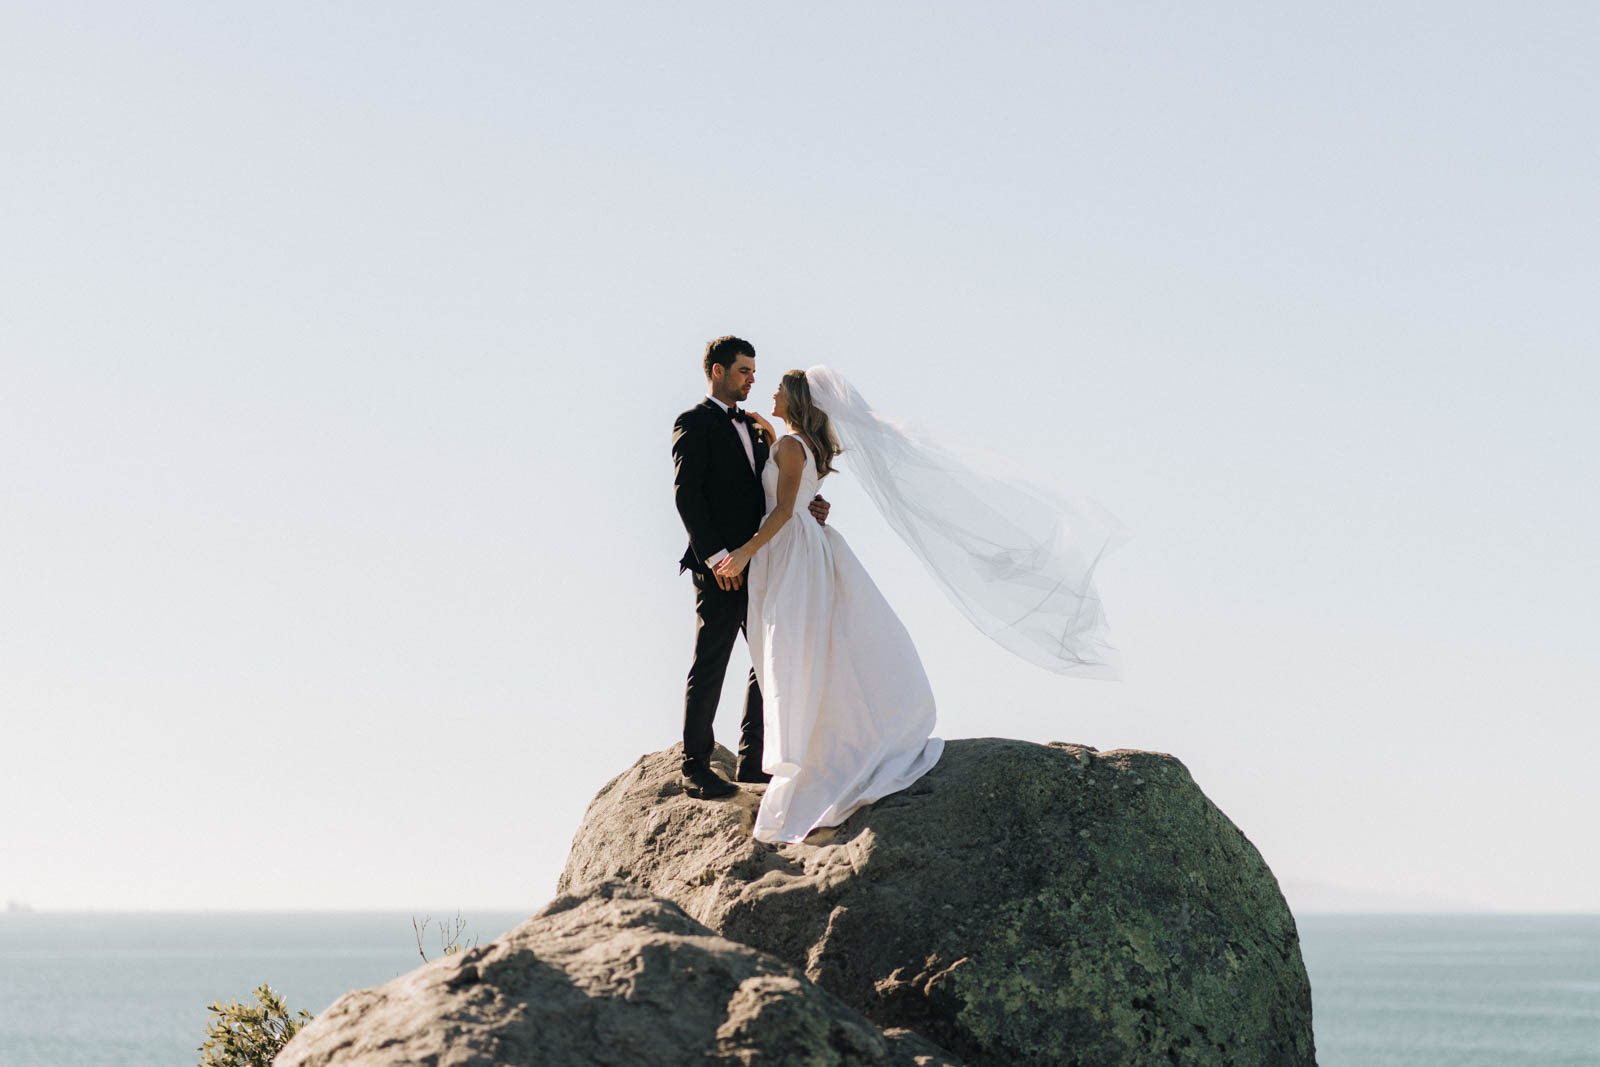 newfound-s-p-mt-maunganui-tauranga-wedding-photographer-1541-A9_05494